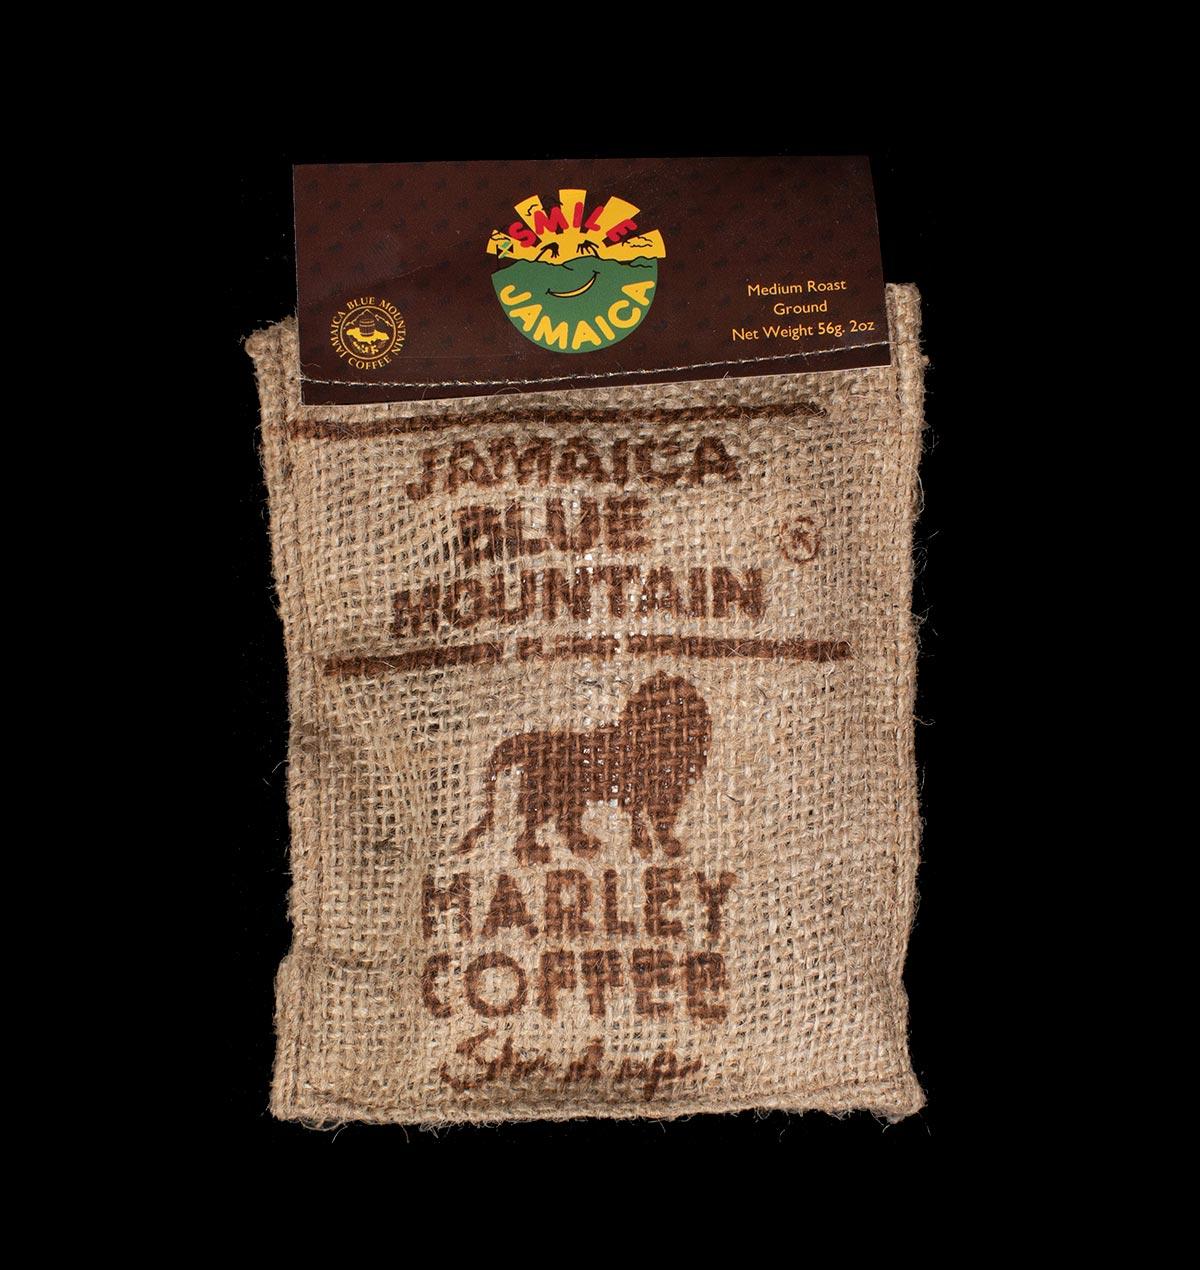 Smile Jamaica Blue Mountain Marley Coffee Bag